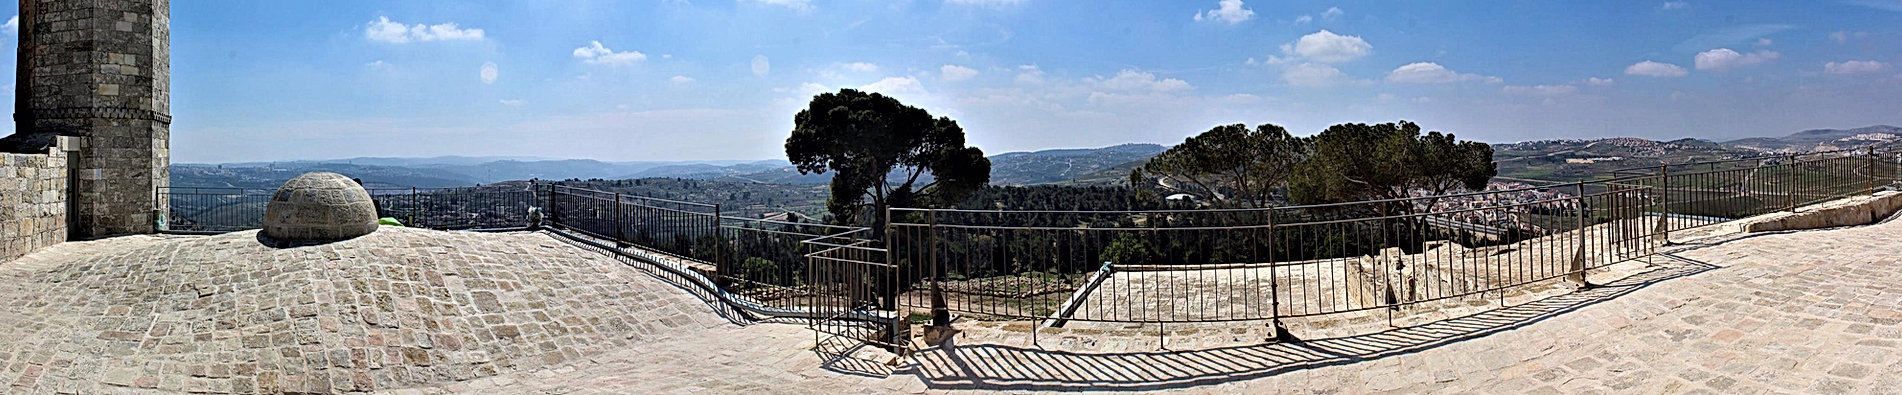 kever shmuel panorama 1-4129x1363.jpg